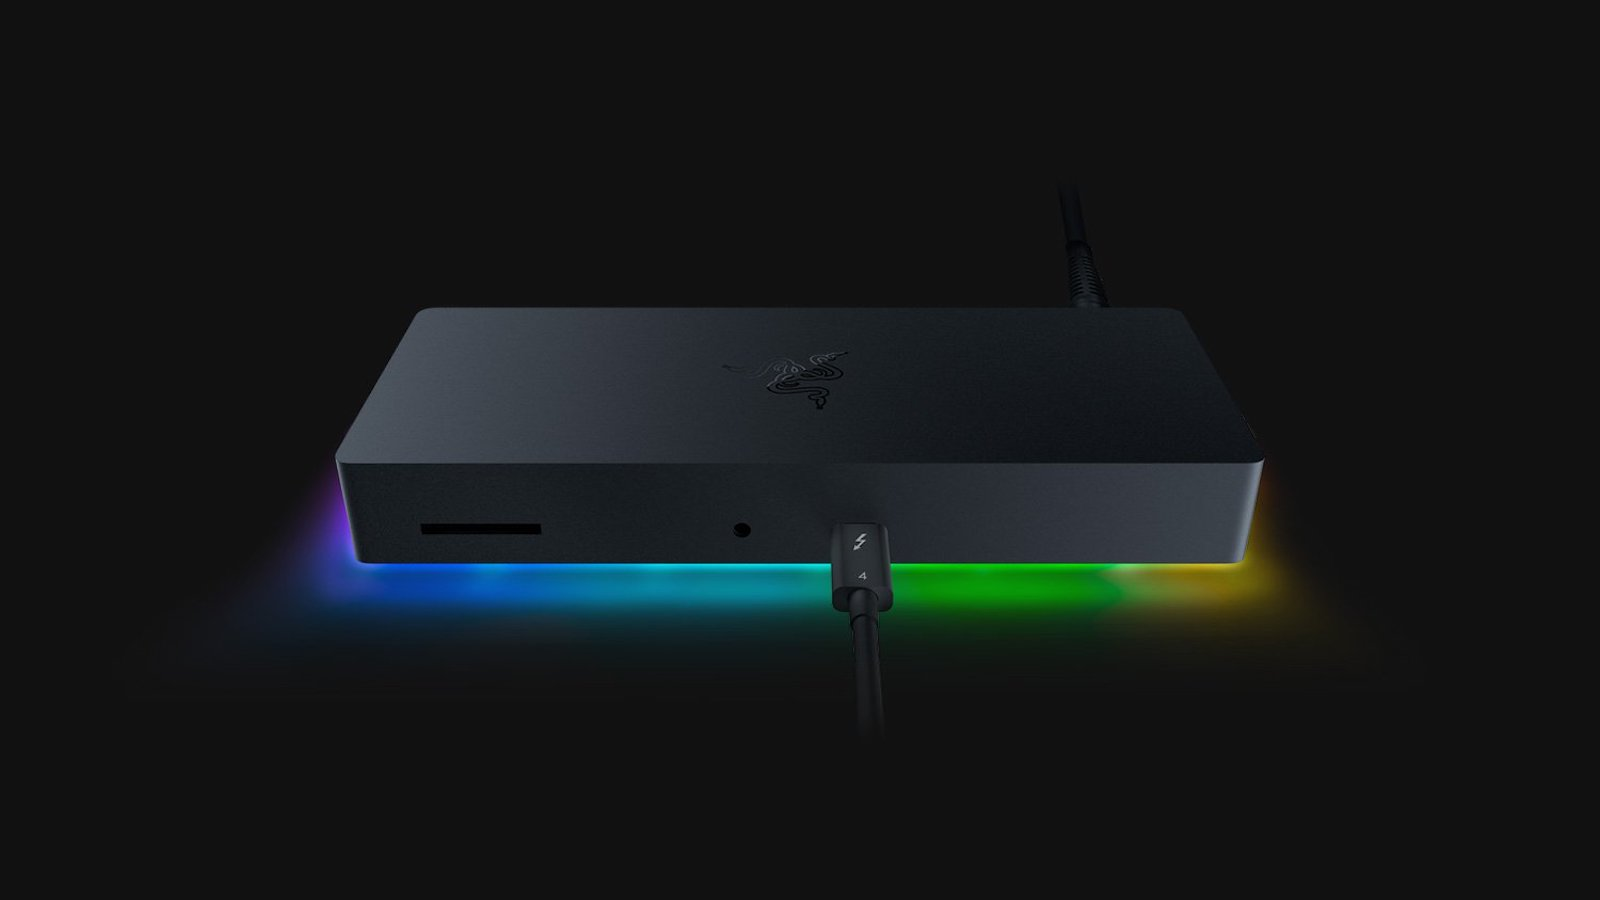 Razer Thunderbolt 4 Dock Chroma customizable hub includes 10 ports & pass-through charging